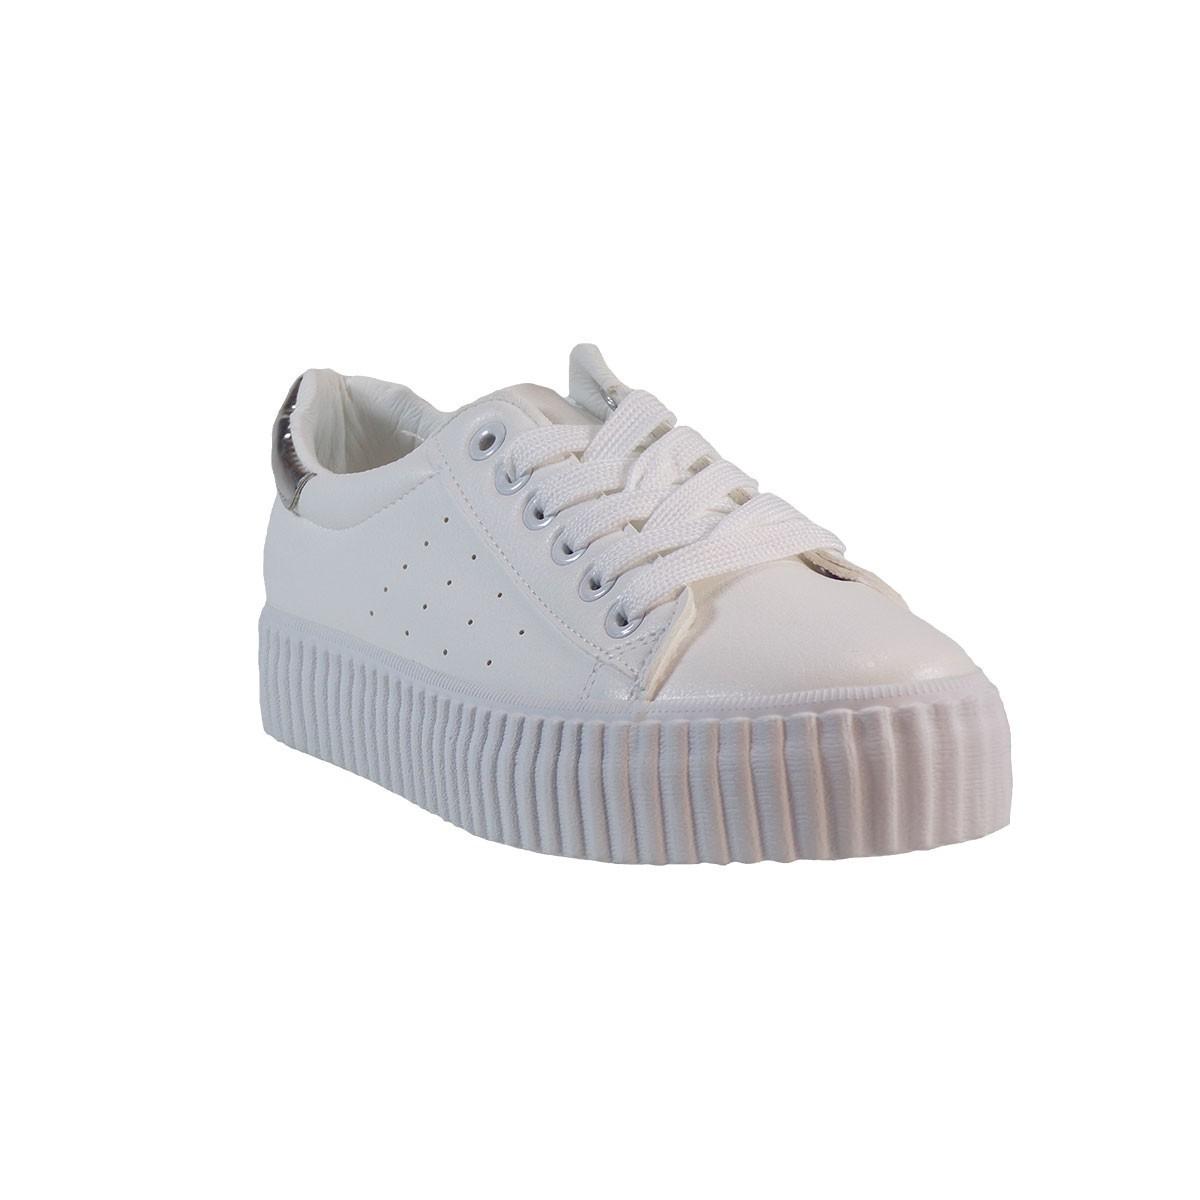 Bagiota Shoes Γυναικεία Παπούτσια Sneakers 3909-2 Άσπρο-Ασημί